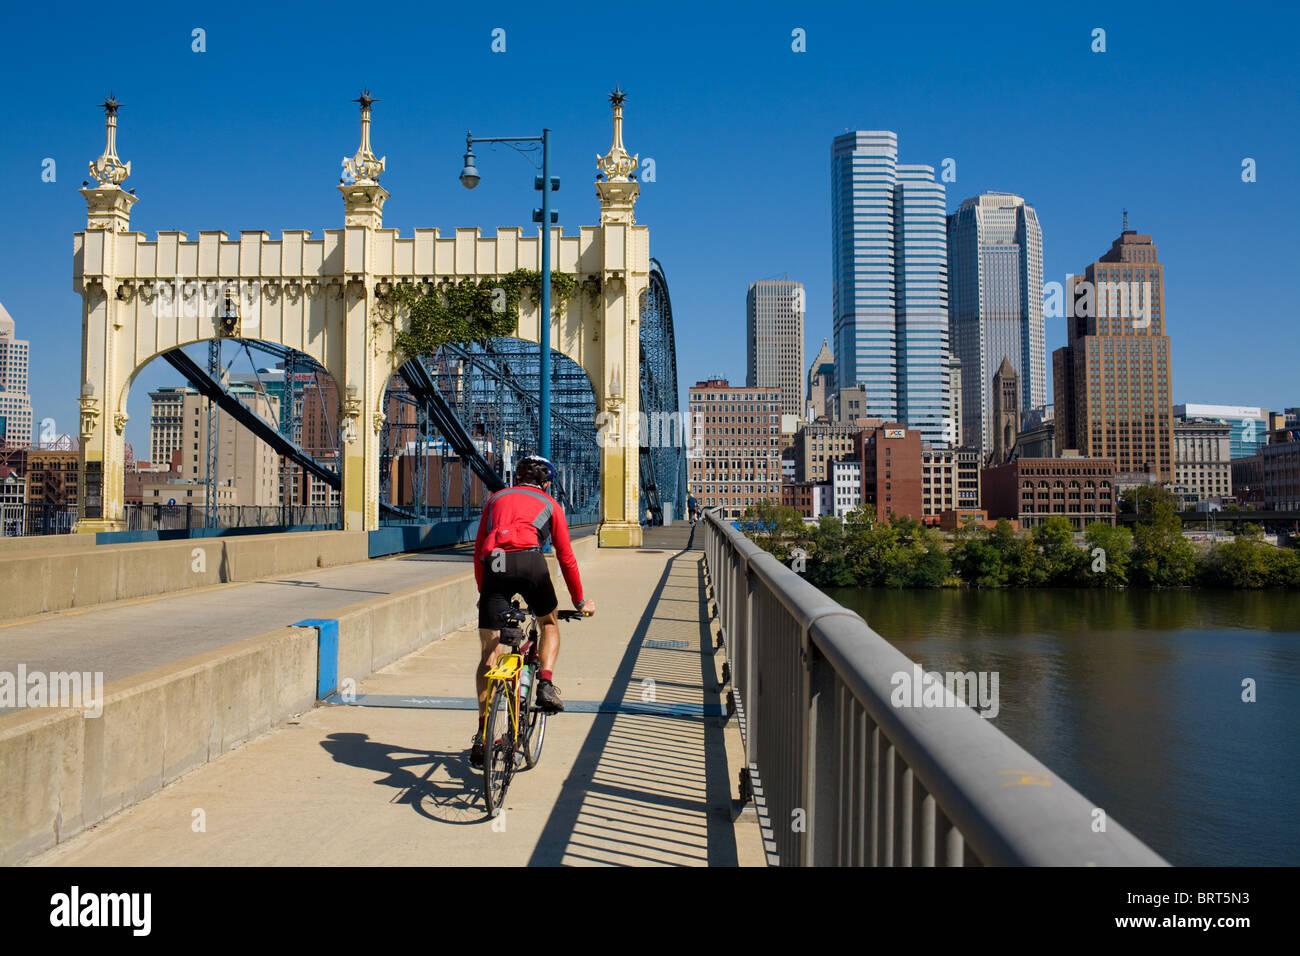 Biker crossing Smithfield Street Bridge over Monongahela River, Pittsburgh, Pennsylvania - Stock Image